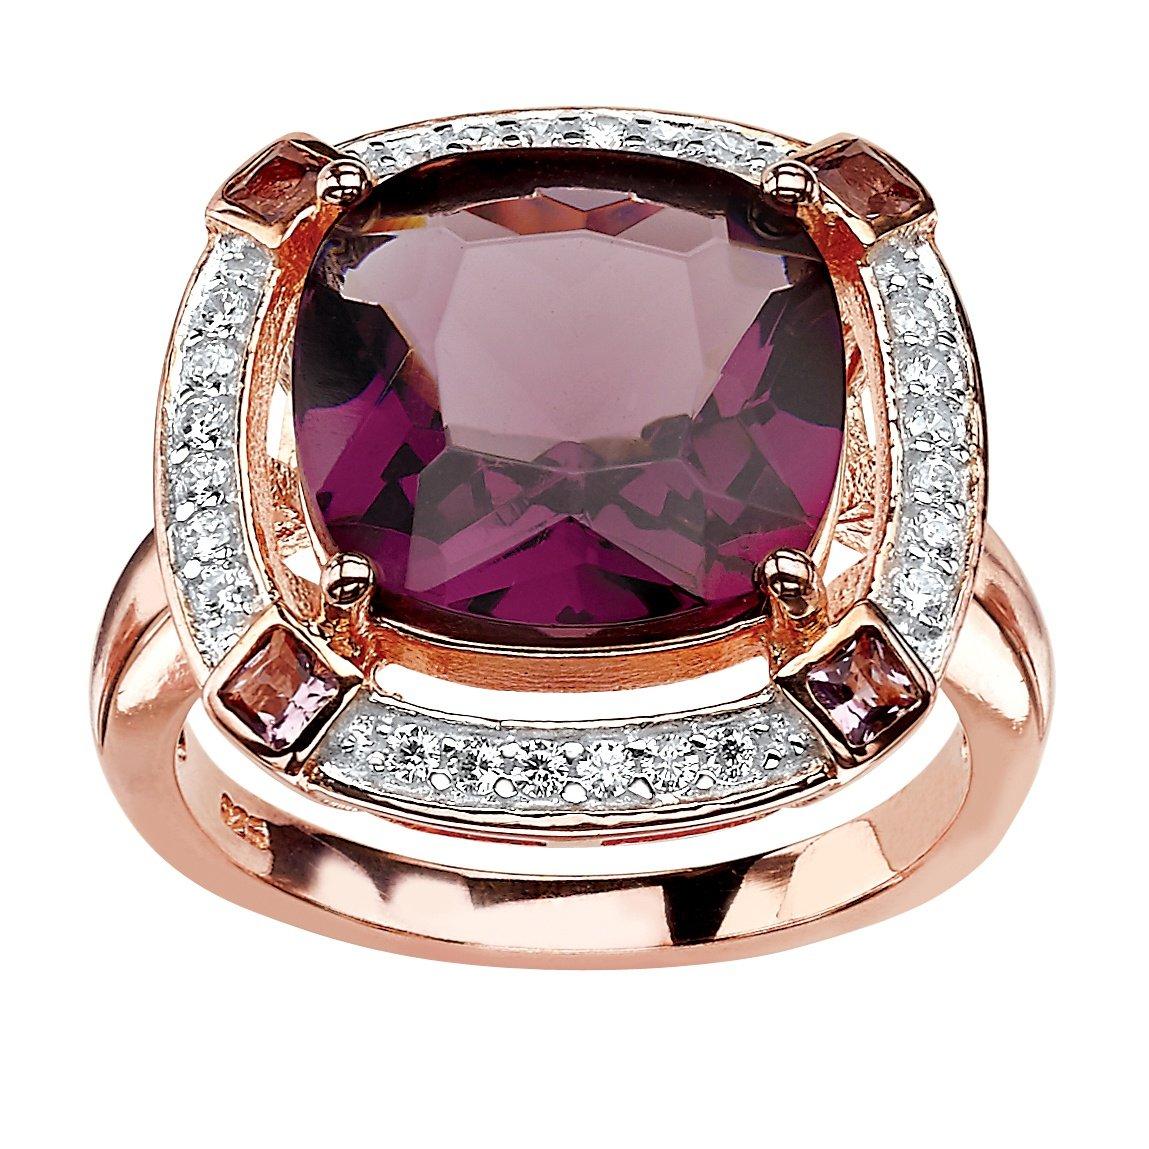 Seta Jewelry Cushion-Cut Simulated Amethyst & CZ Rose Gold-Plated .925 Silver Halo Ring